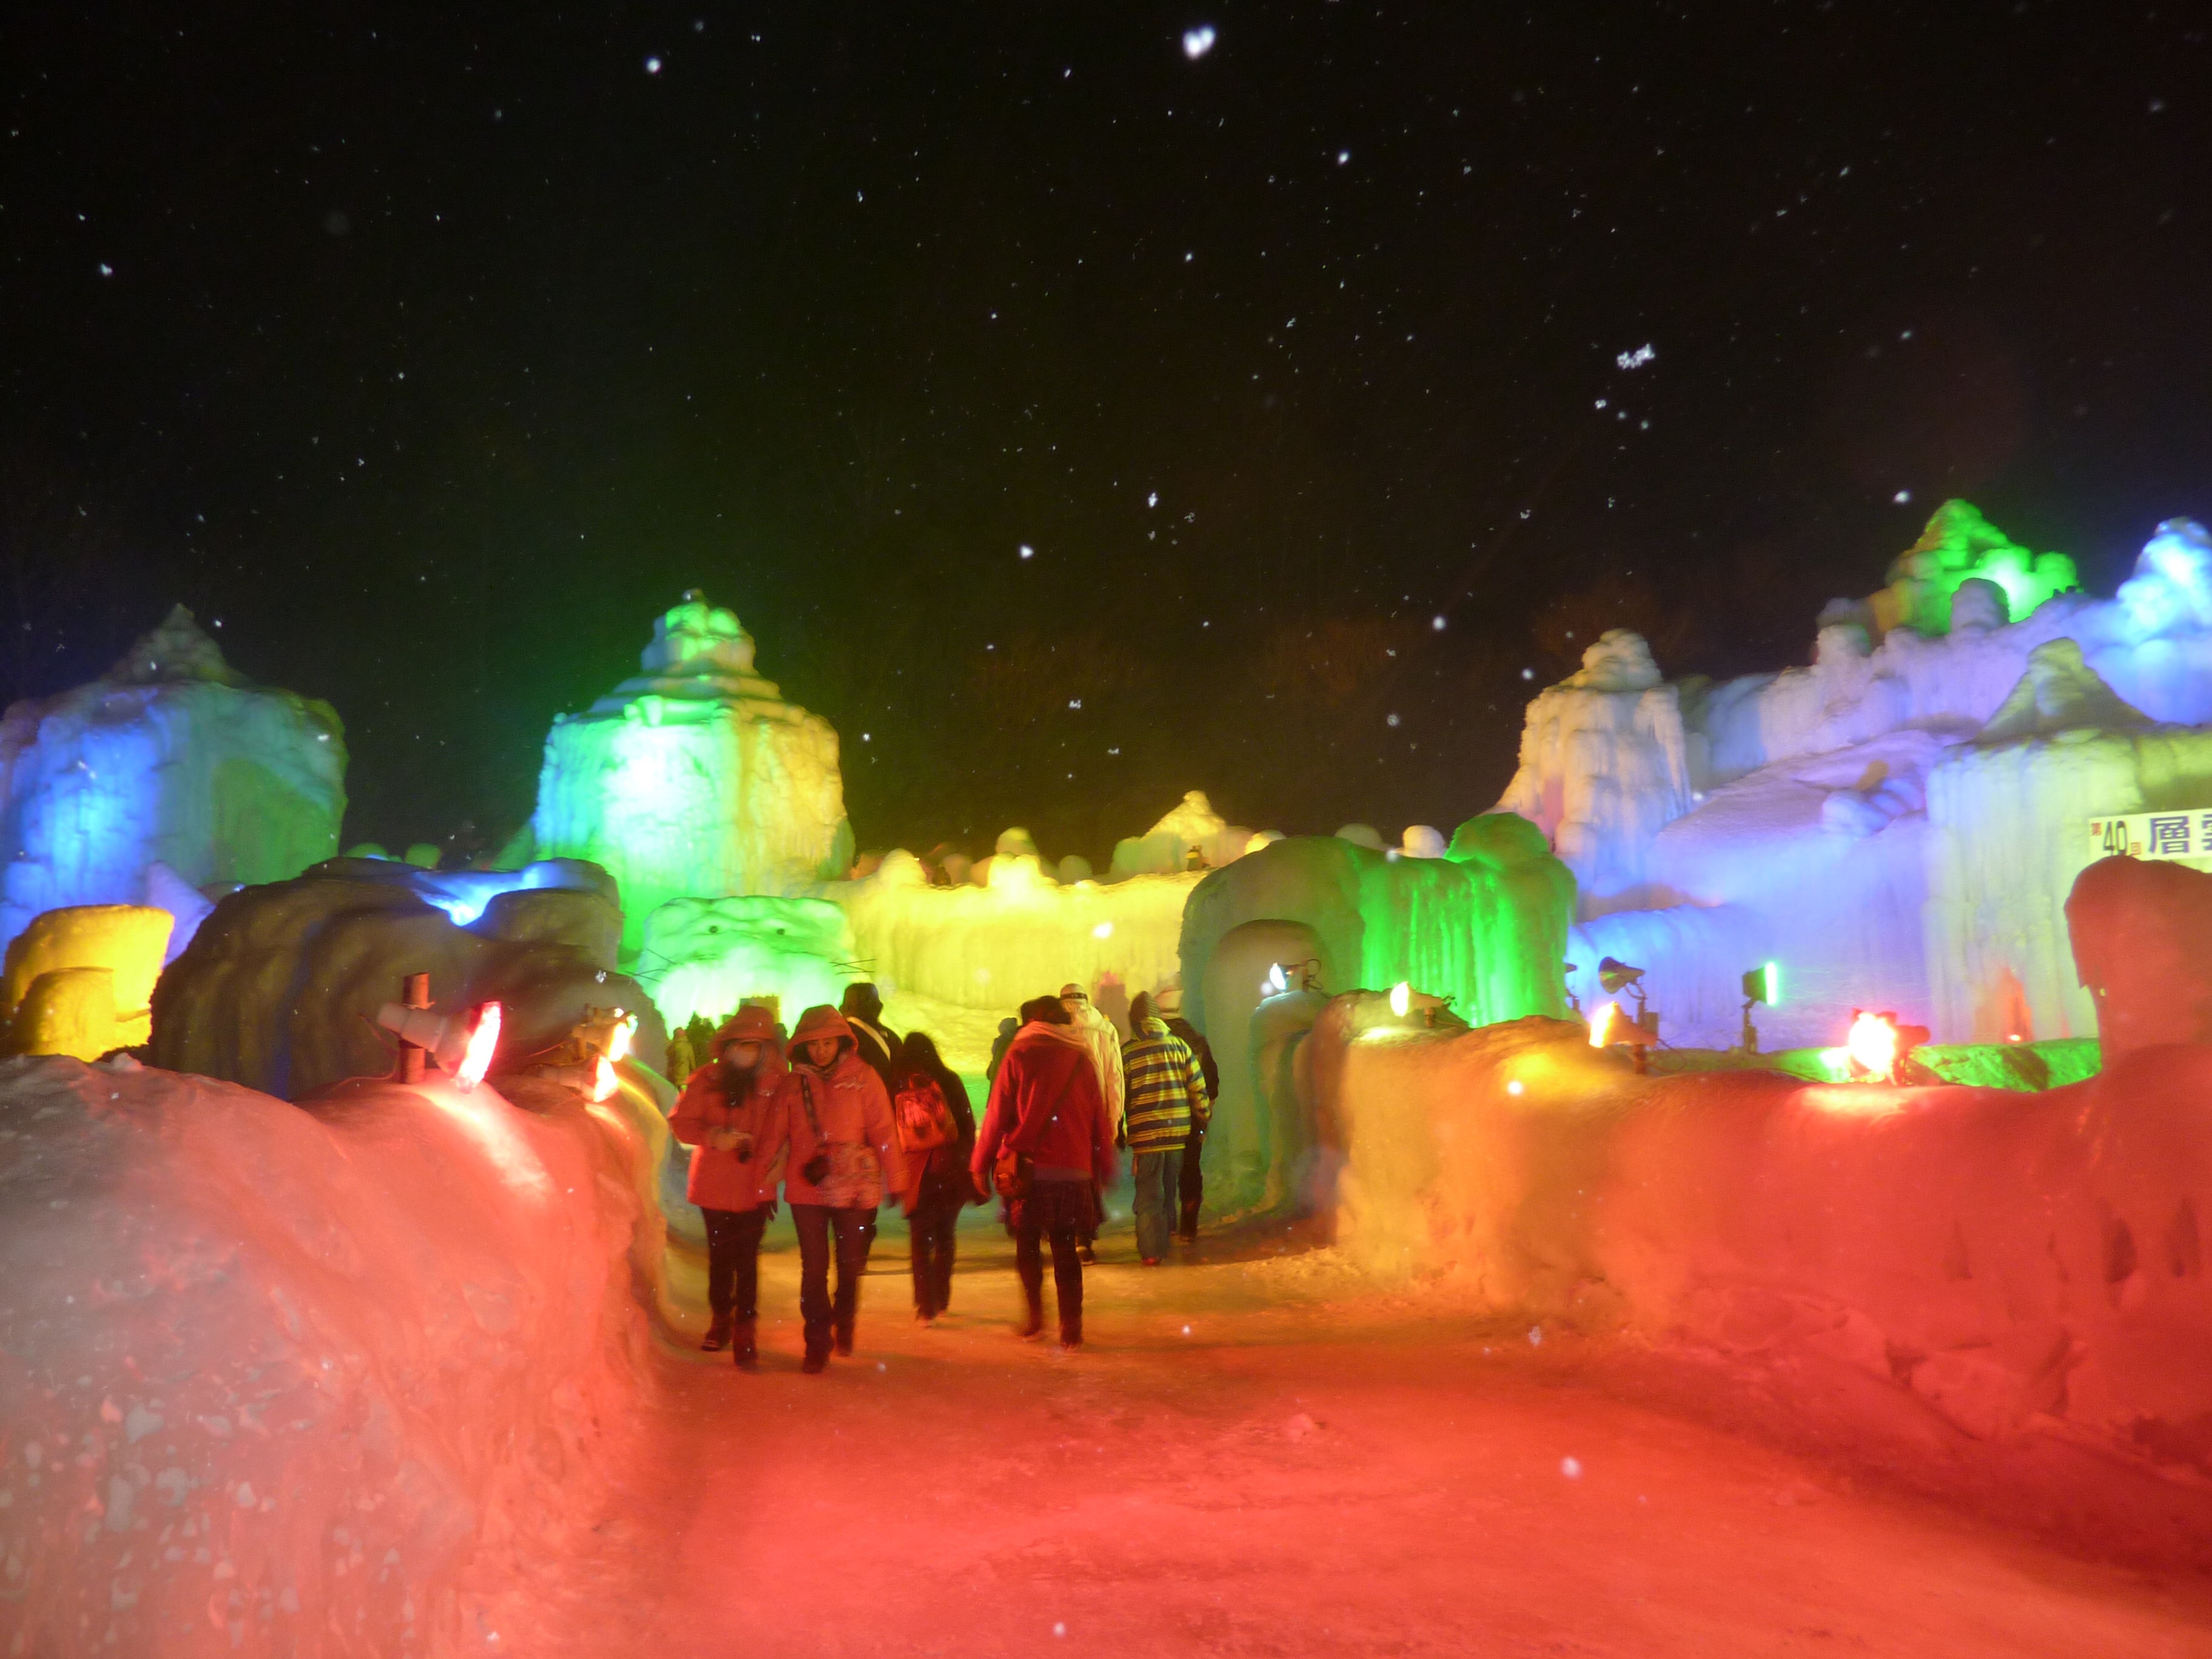 Hokkaido Snow Festival #2 – Feb 4-11, 2015